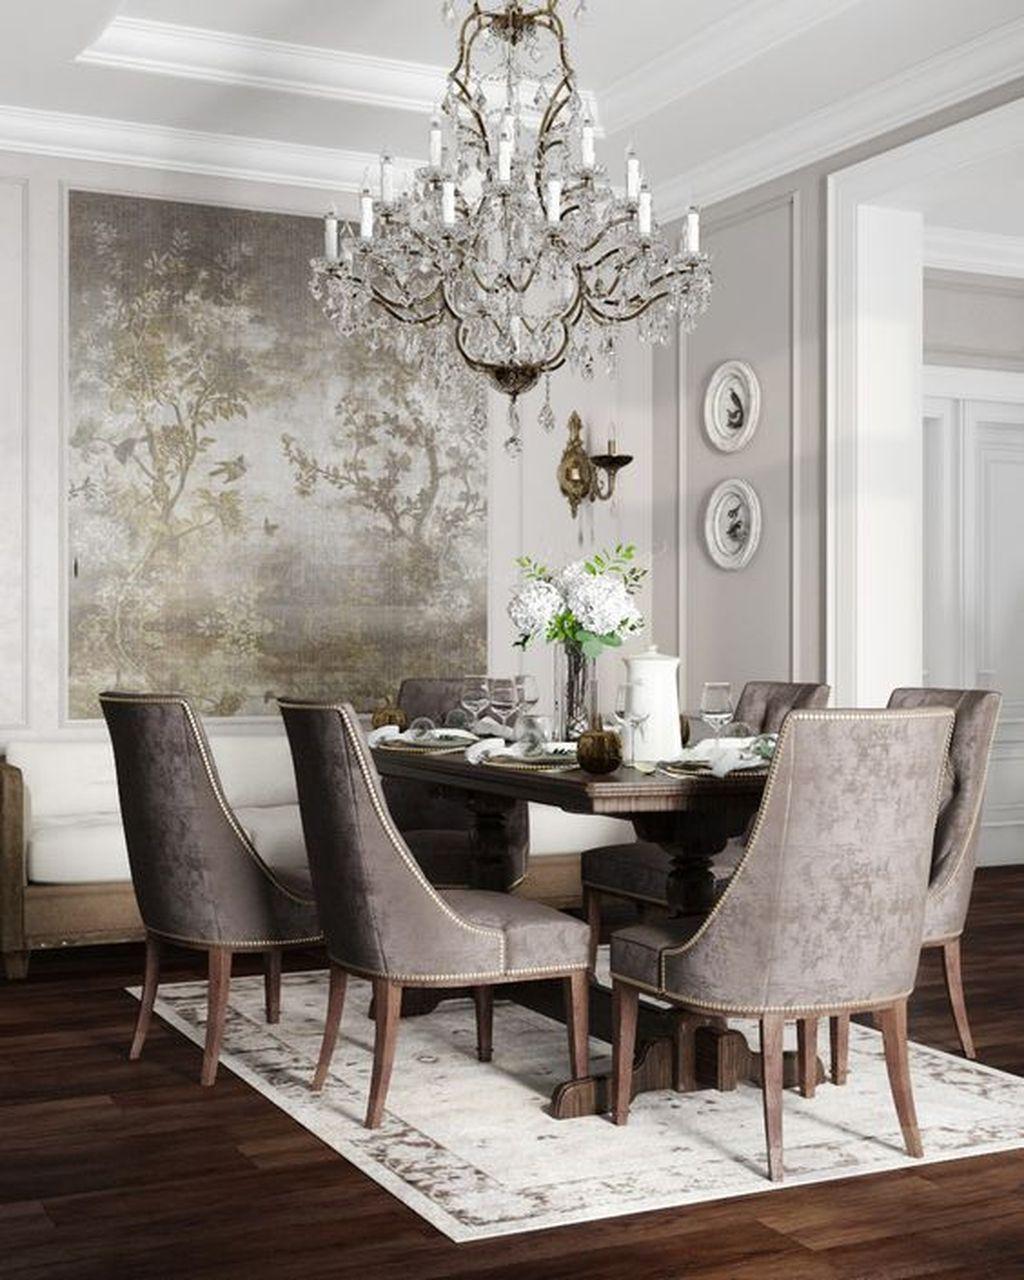 23 Elegant Traditional Dining Room Design Ideas: Pin On Dining Room Ideas